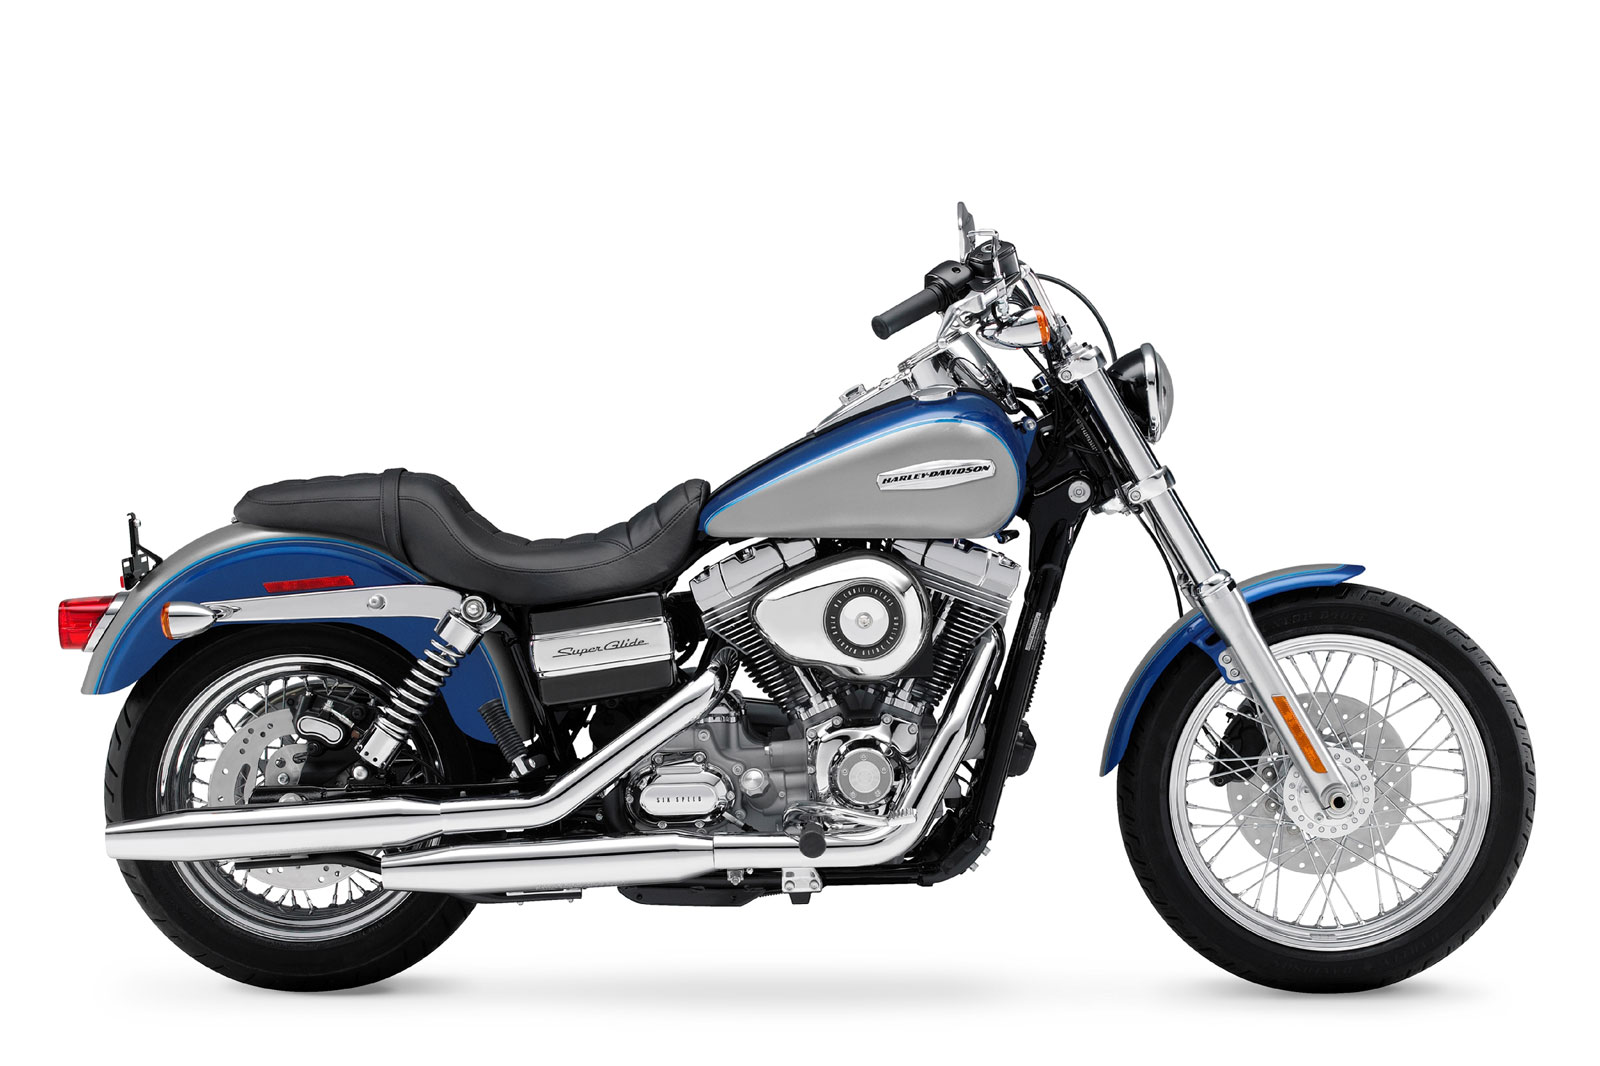 Motor Sport Harley Davidson Fxdc Dyna Super Glide Custom